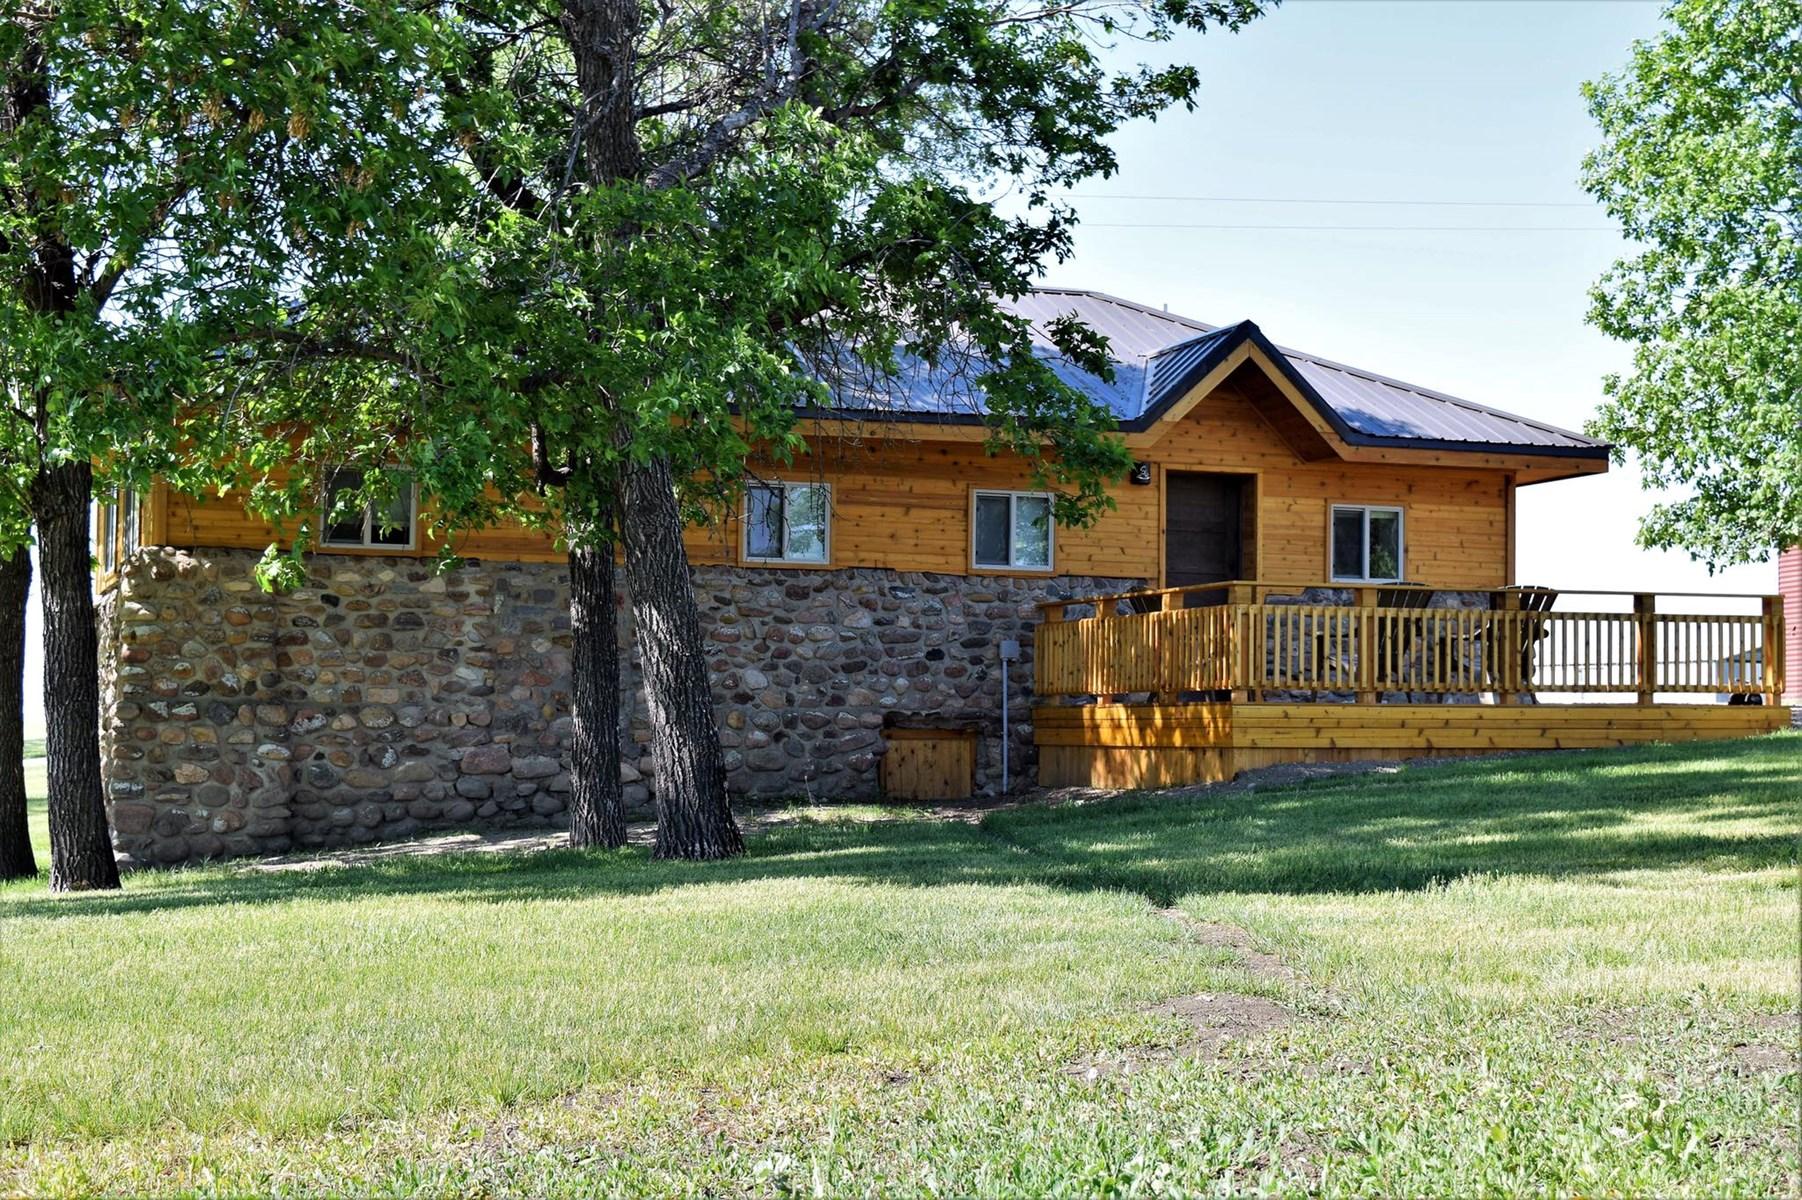 Sleeping Buffalo Resort - Cabin #1 Natural Hot Springs